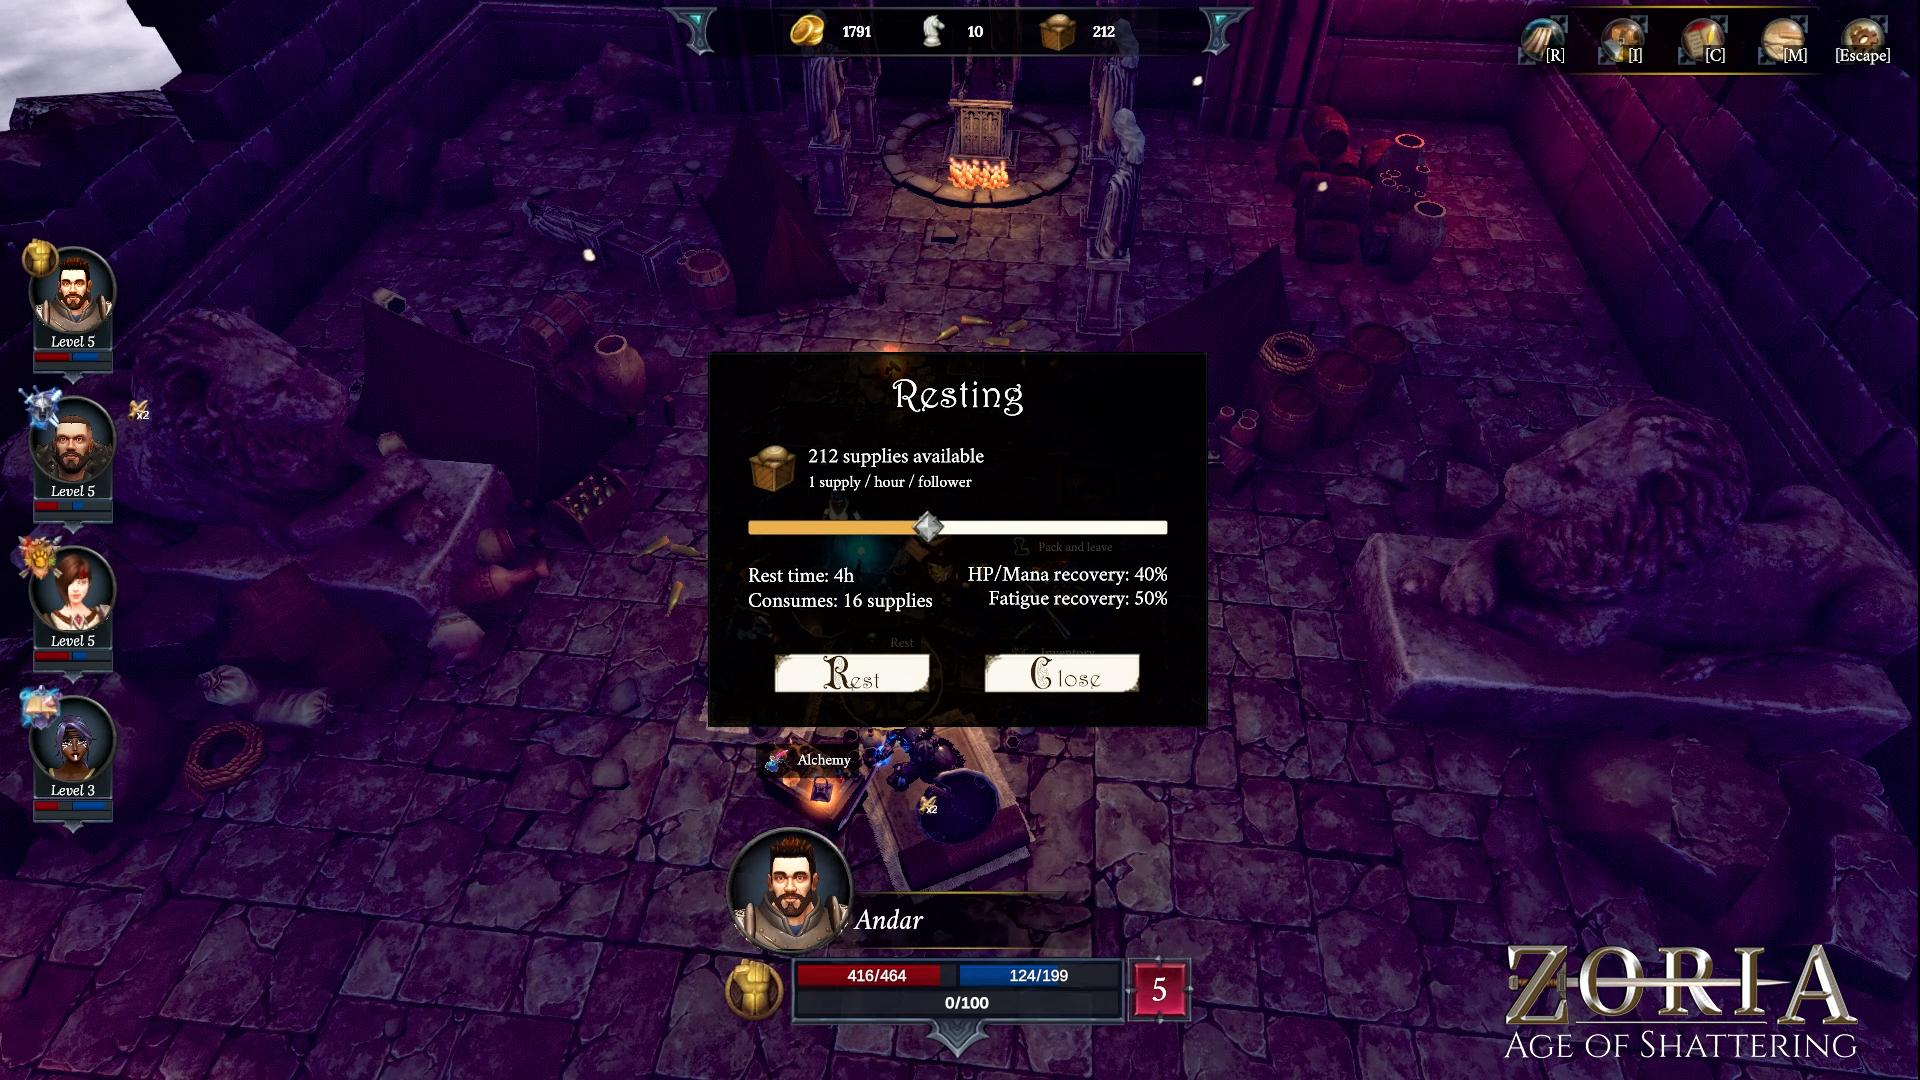 Zoria AgeofShattering Screenshot 3